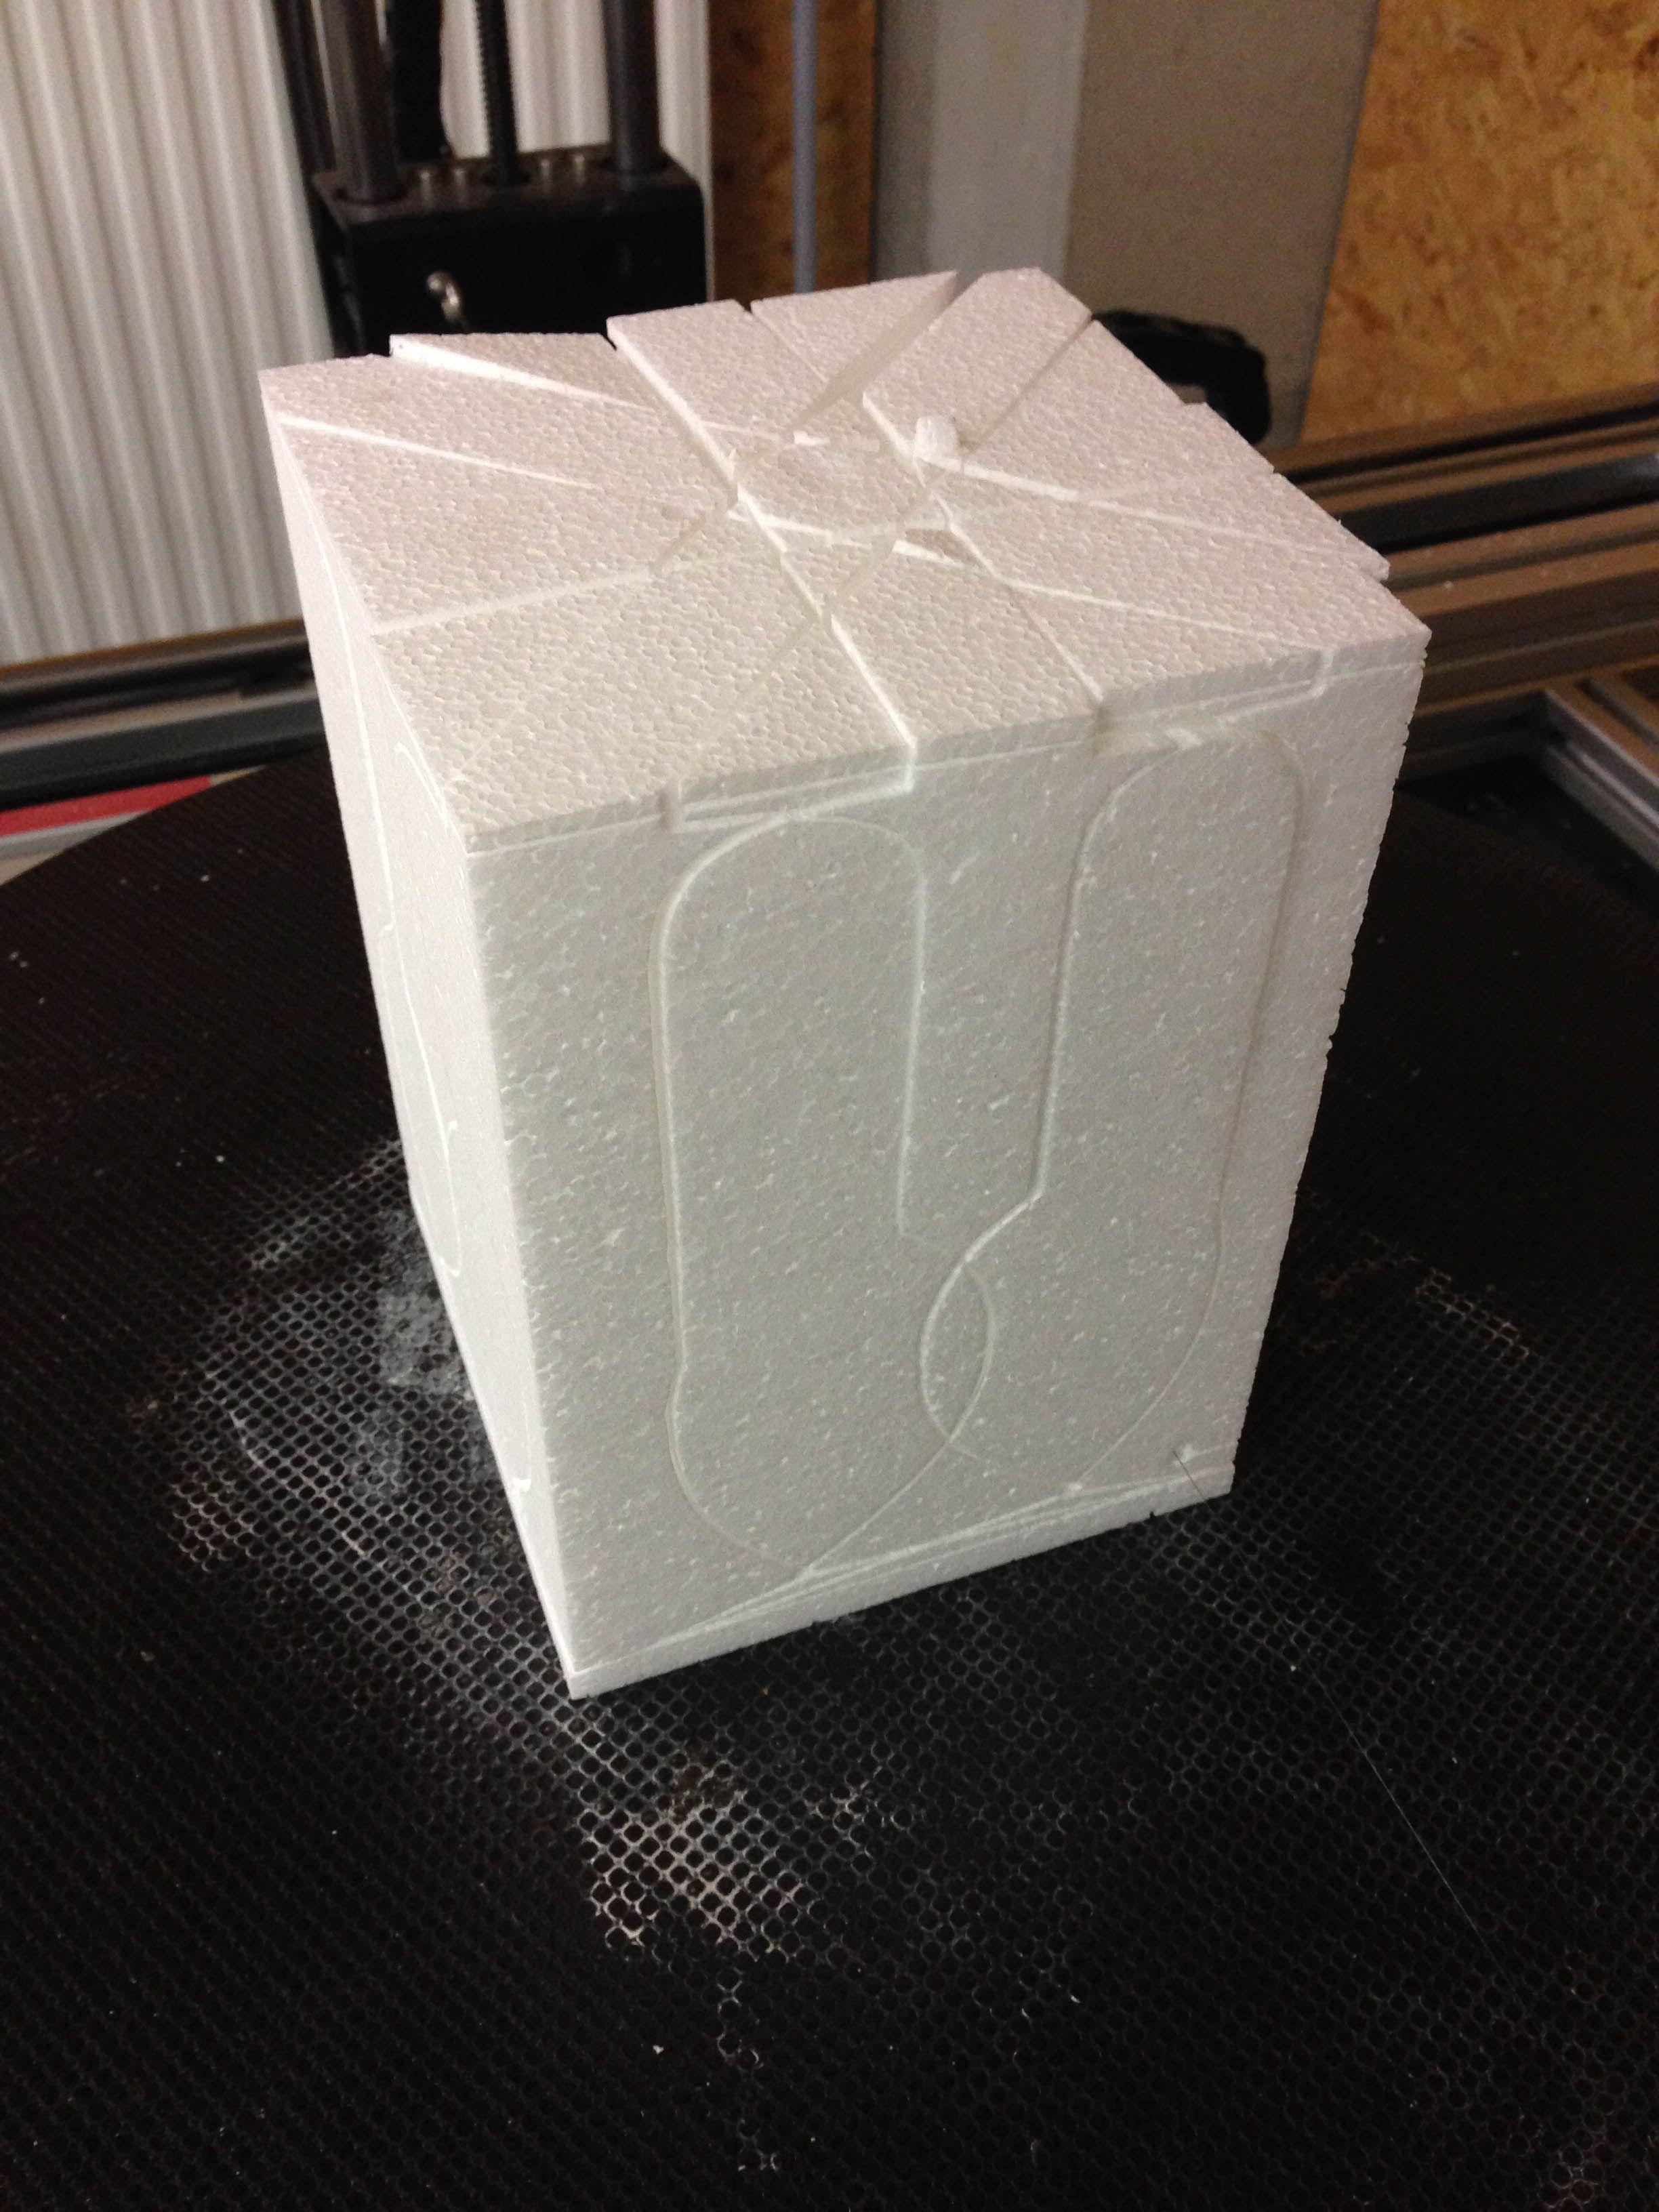 Styrofoam block cutted